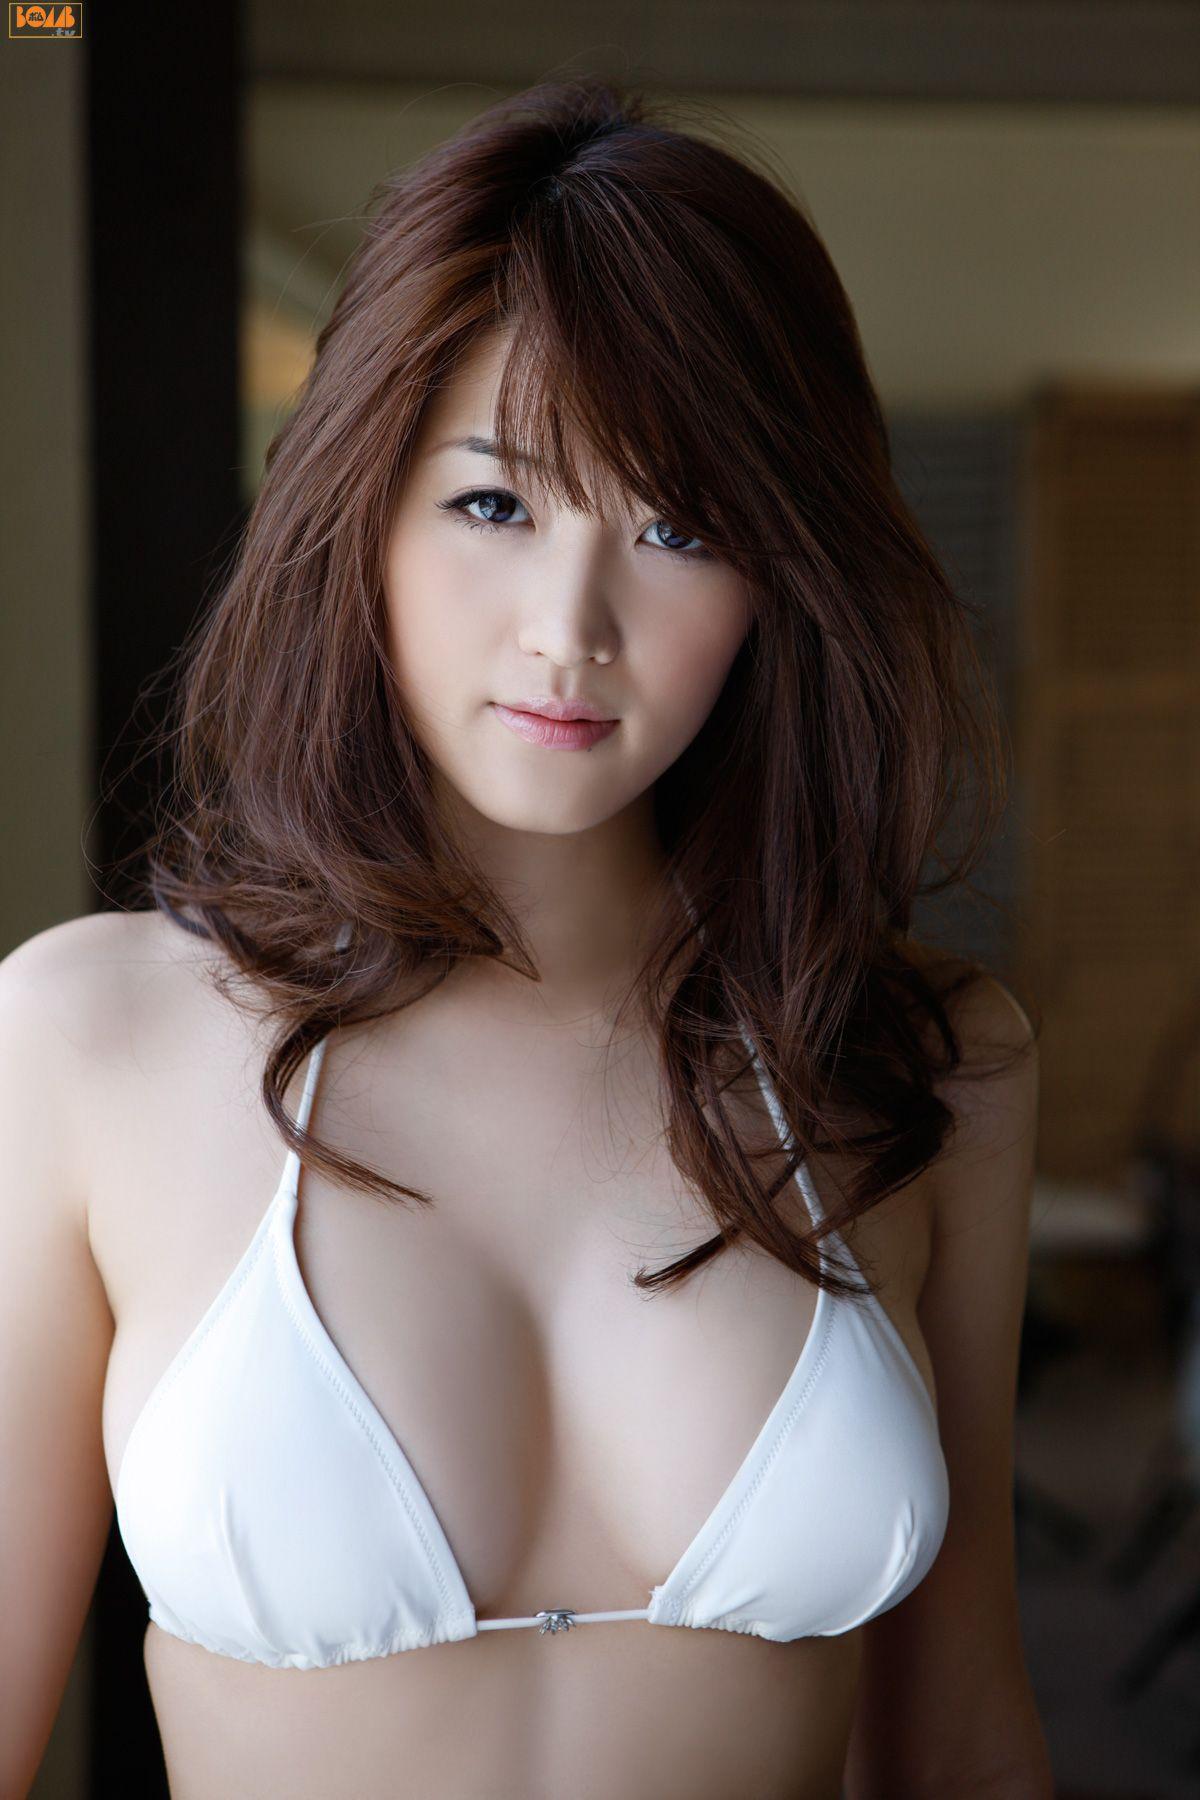 [BOMB.tv] 葉加瀬マイ Mai Hakase